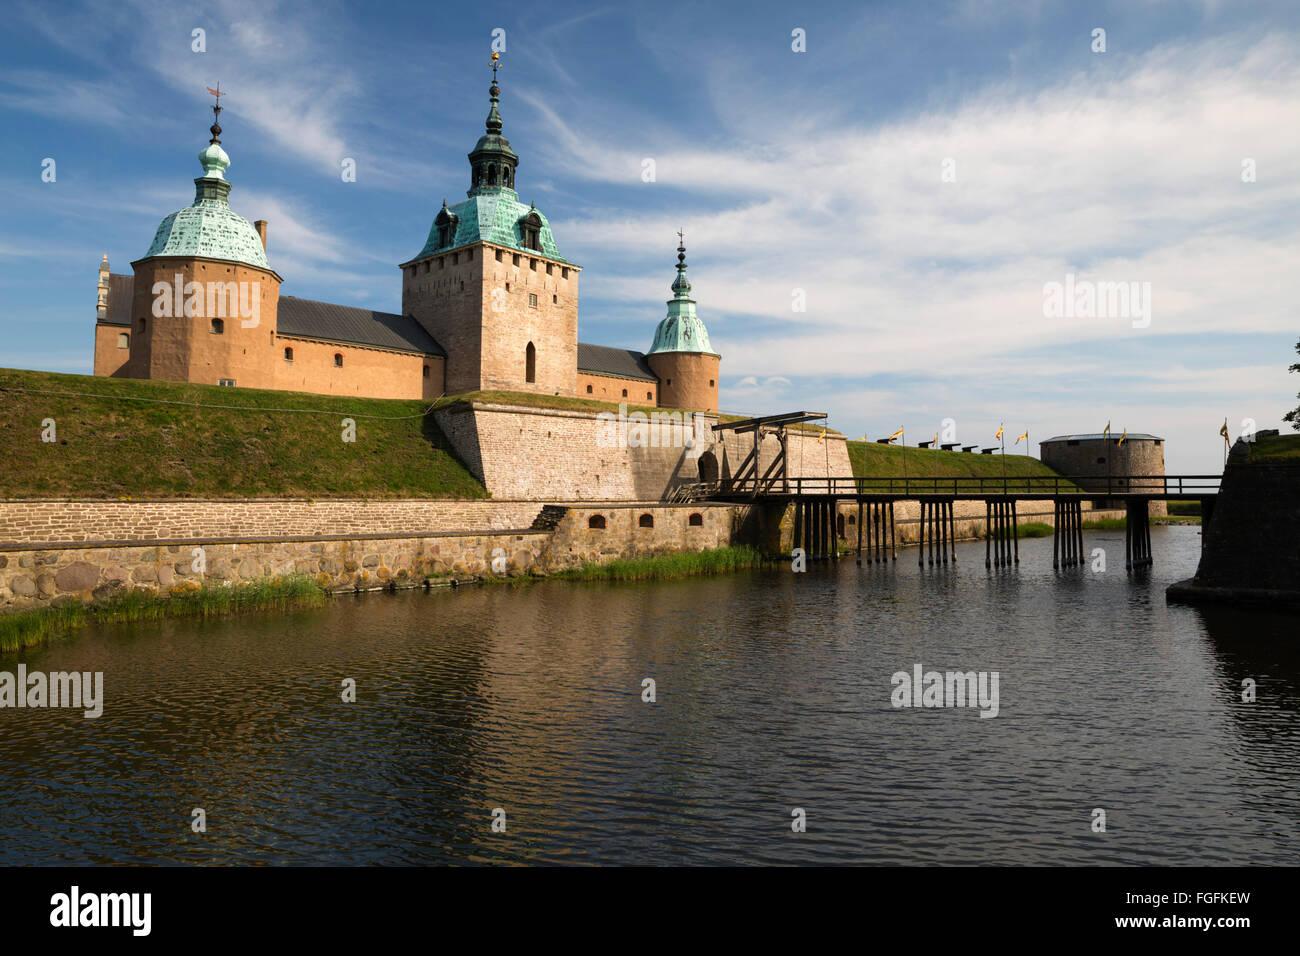 Kalmar Slott castle, Kalmar, Smaland, Southeast Sweden, Sweden, Scandinavia, Europe - Stock Image